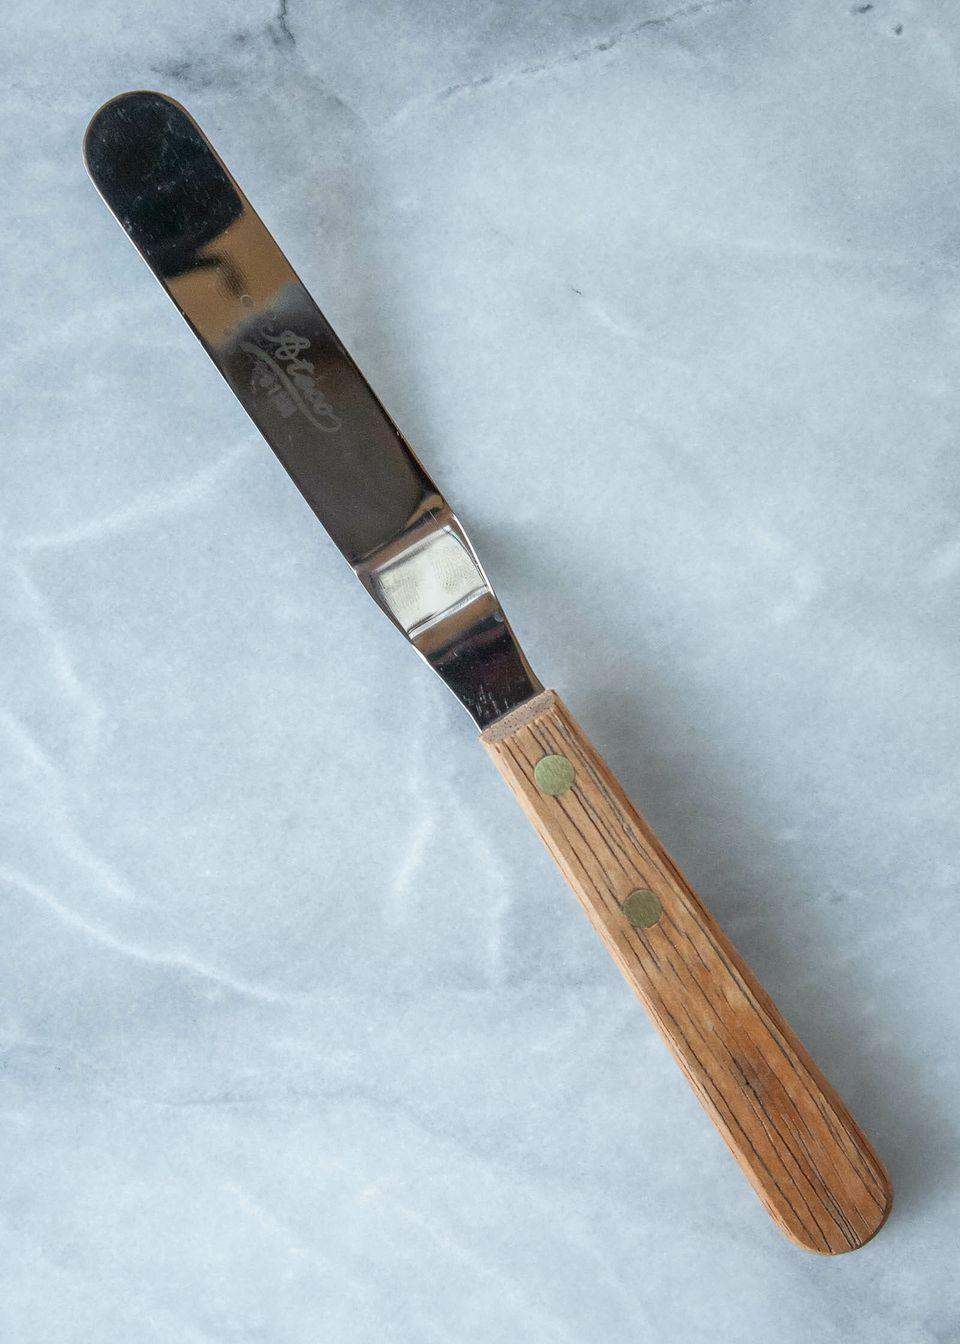 An Ateco offset spatula